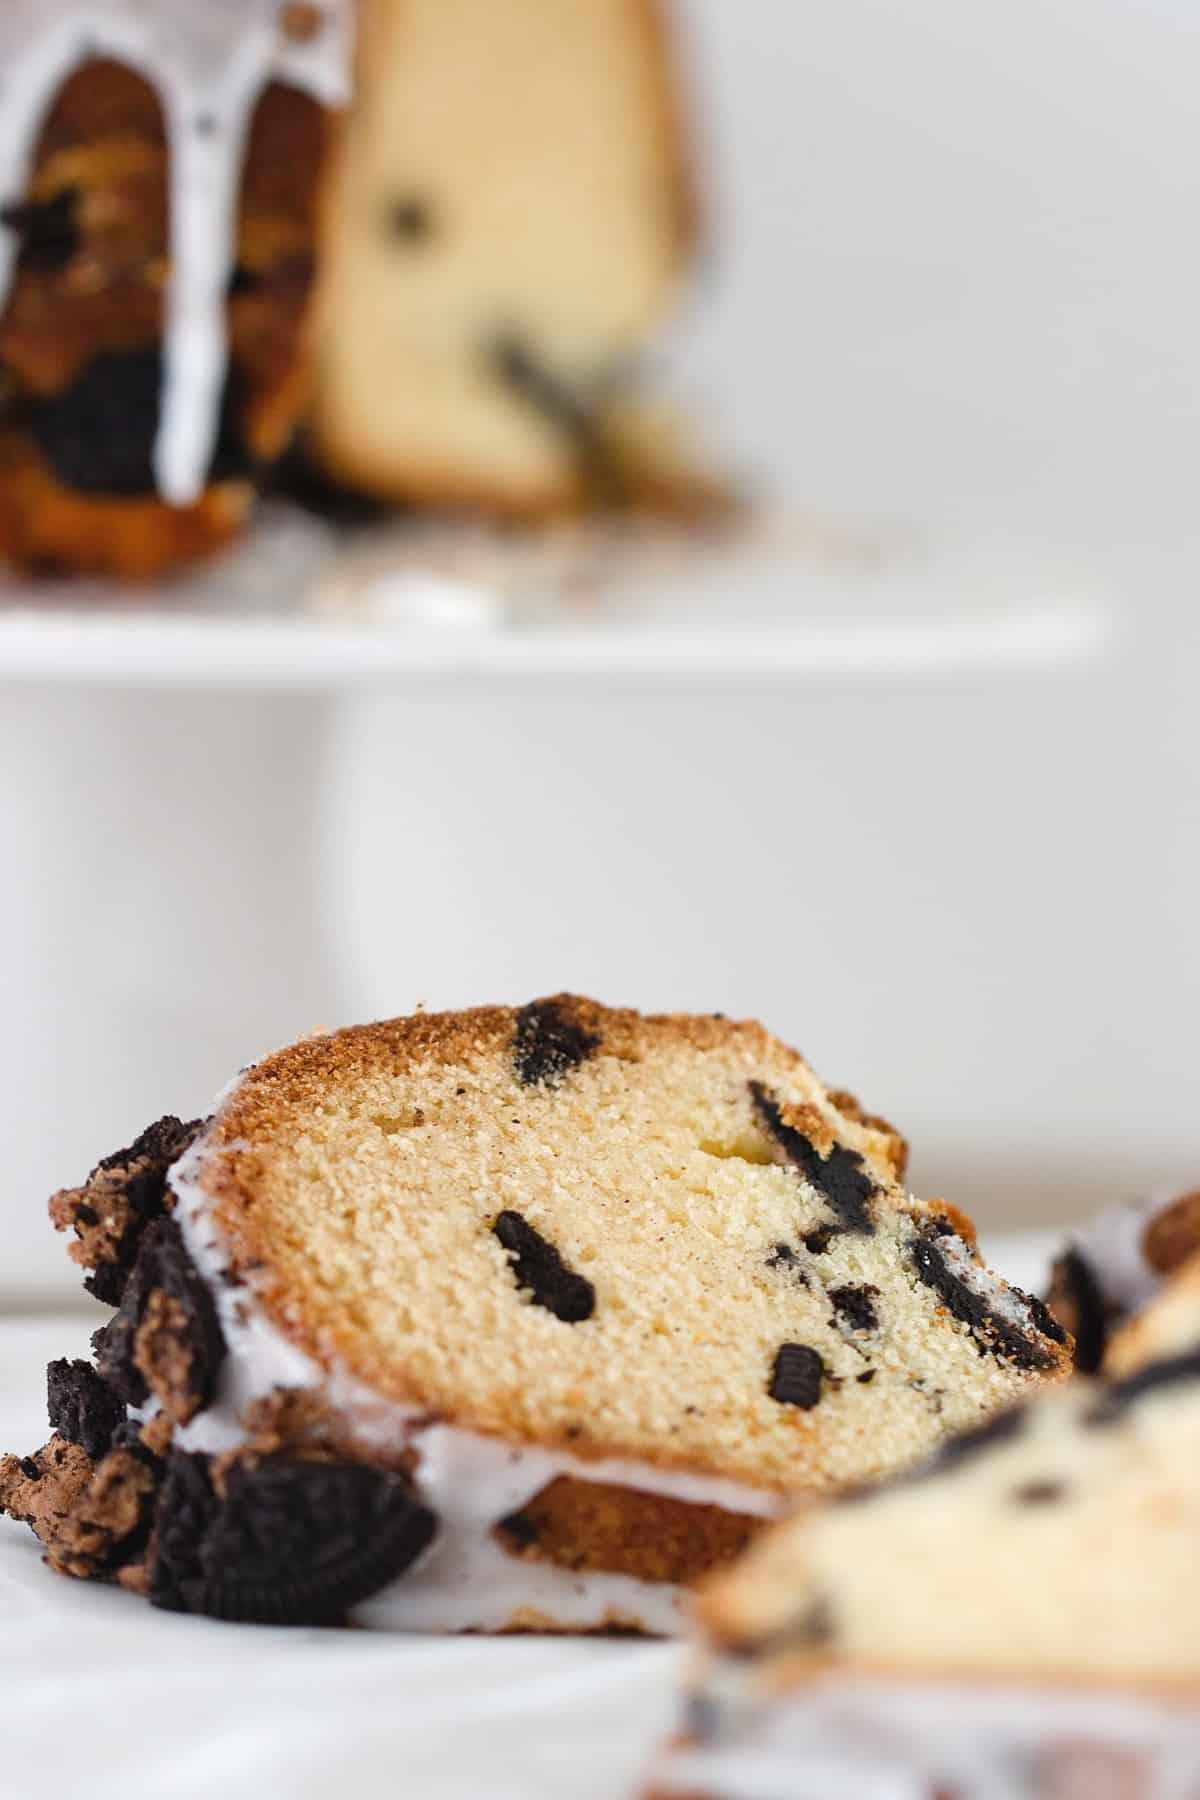 Bundt cookie cake slice, blurred cake on cake stand in background